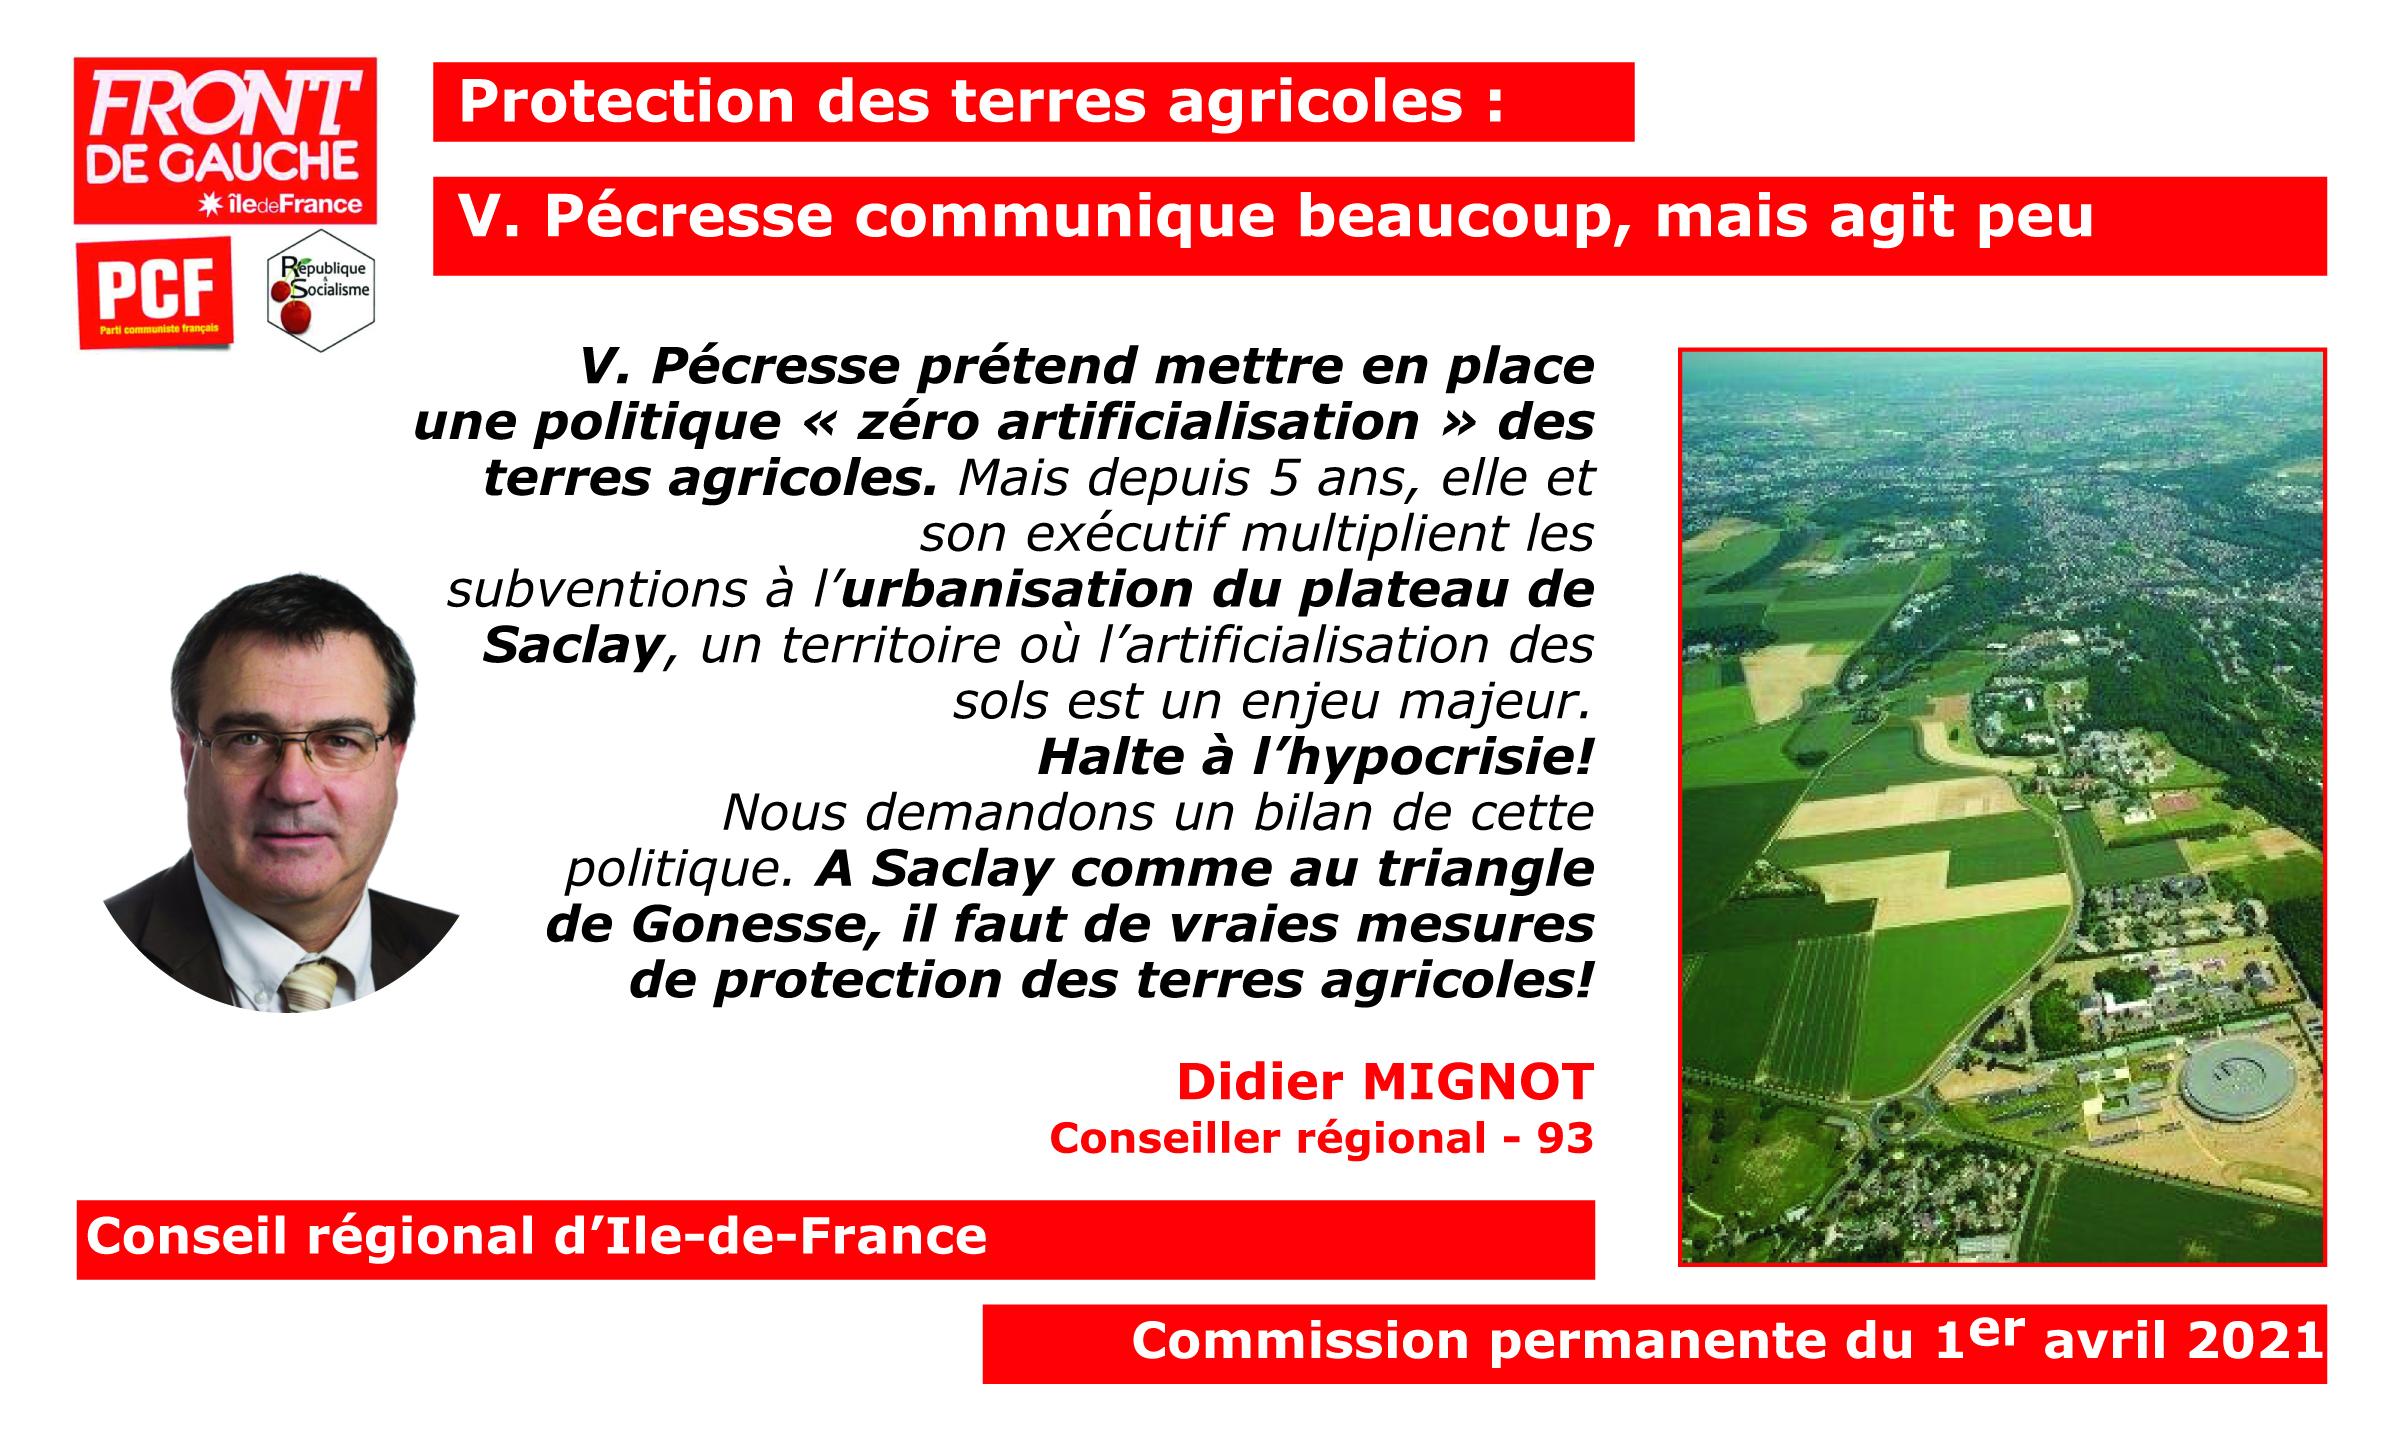 Protection des terres agricoles